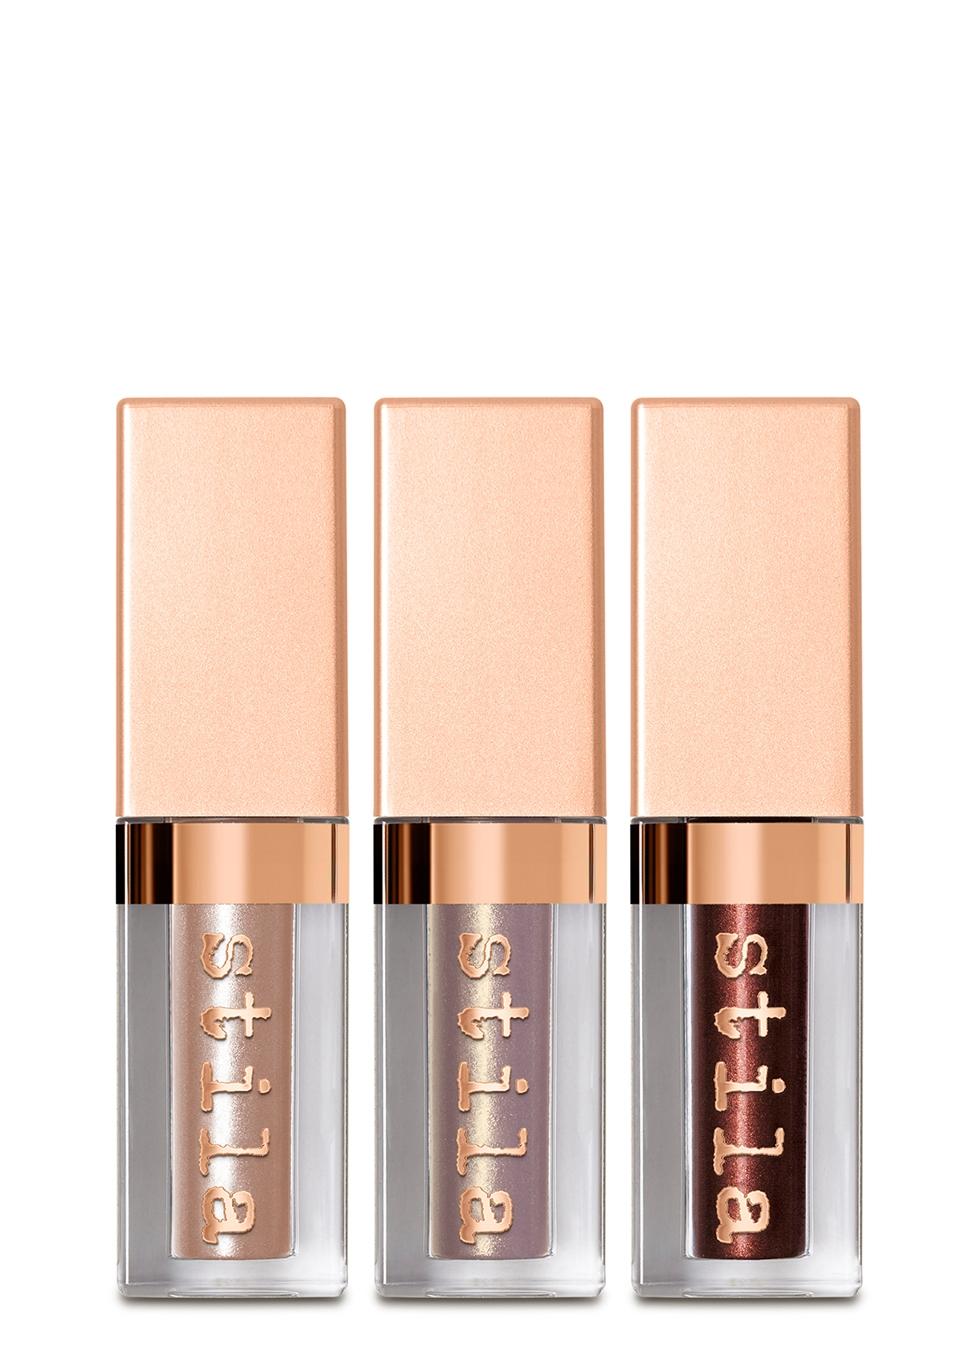 Shimmering Heights Shimmer & Glow Liquid Eyeshadow Set - Stila